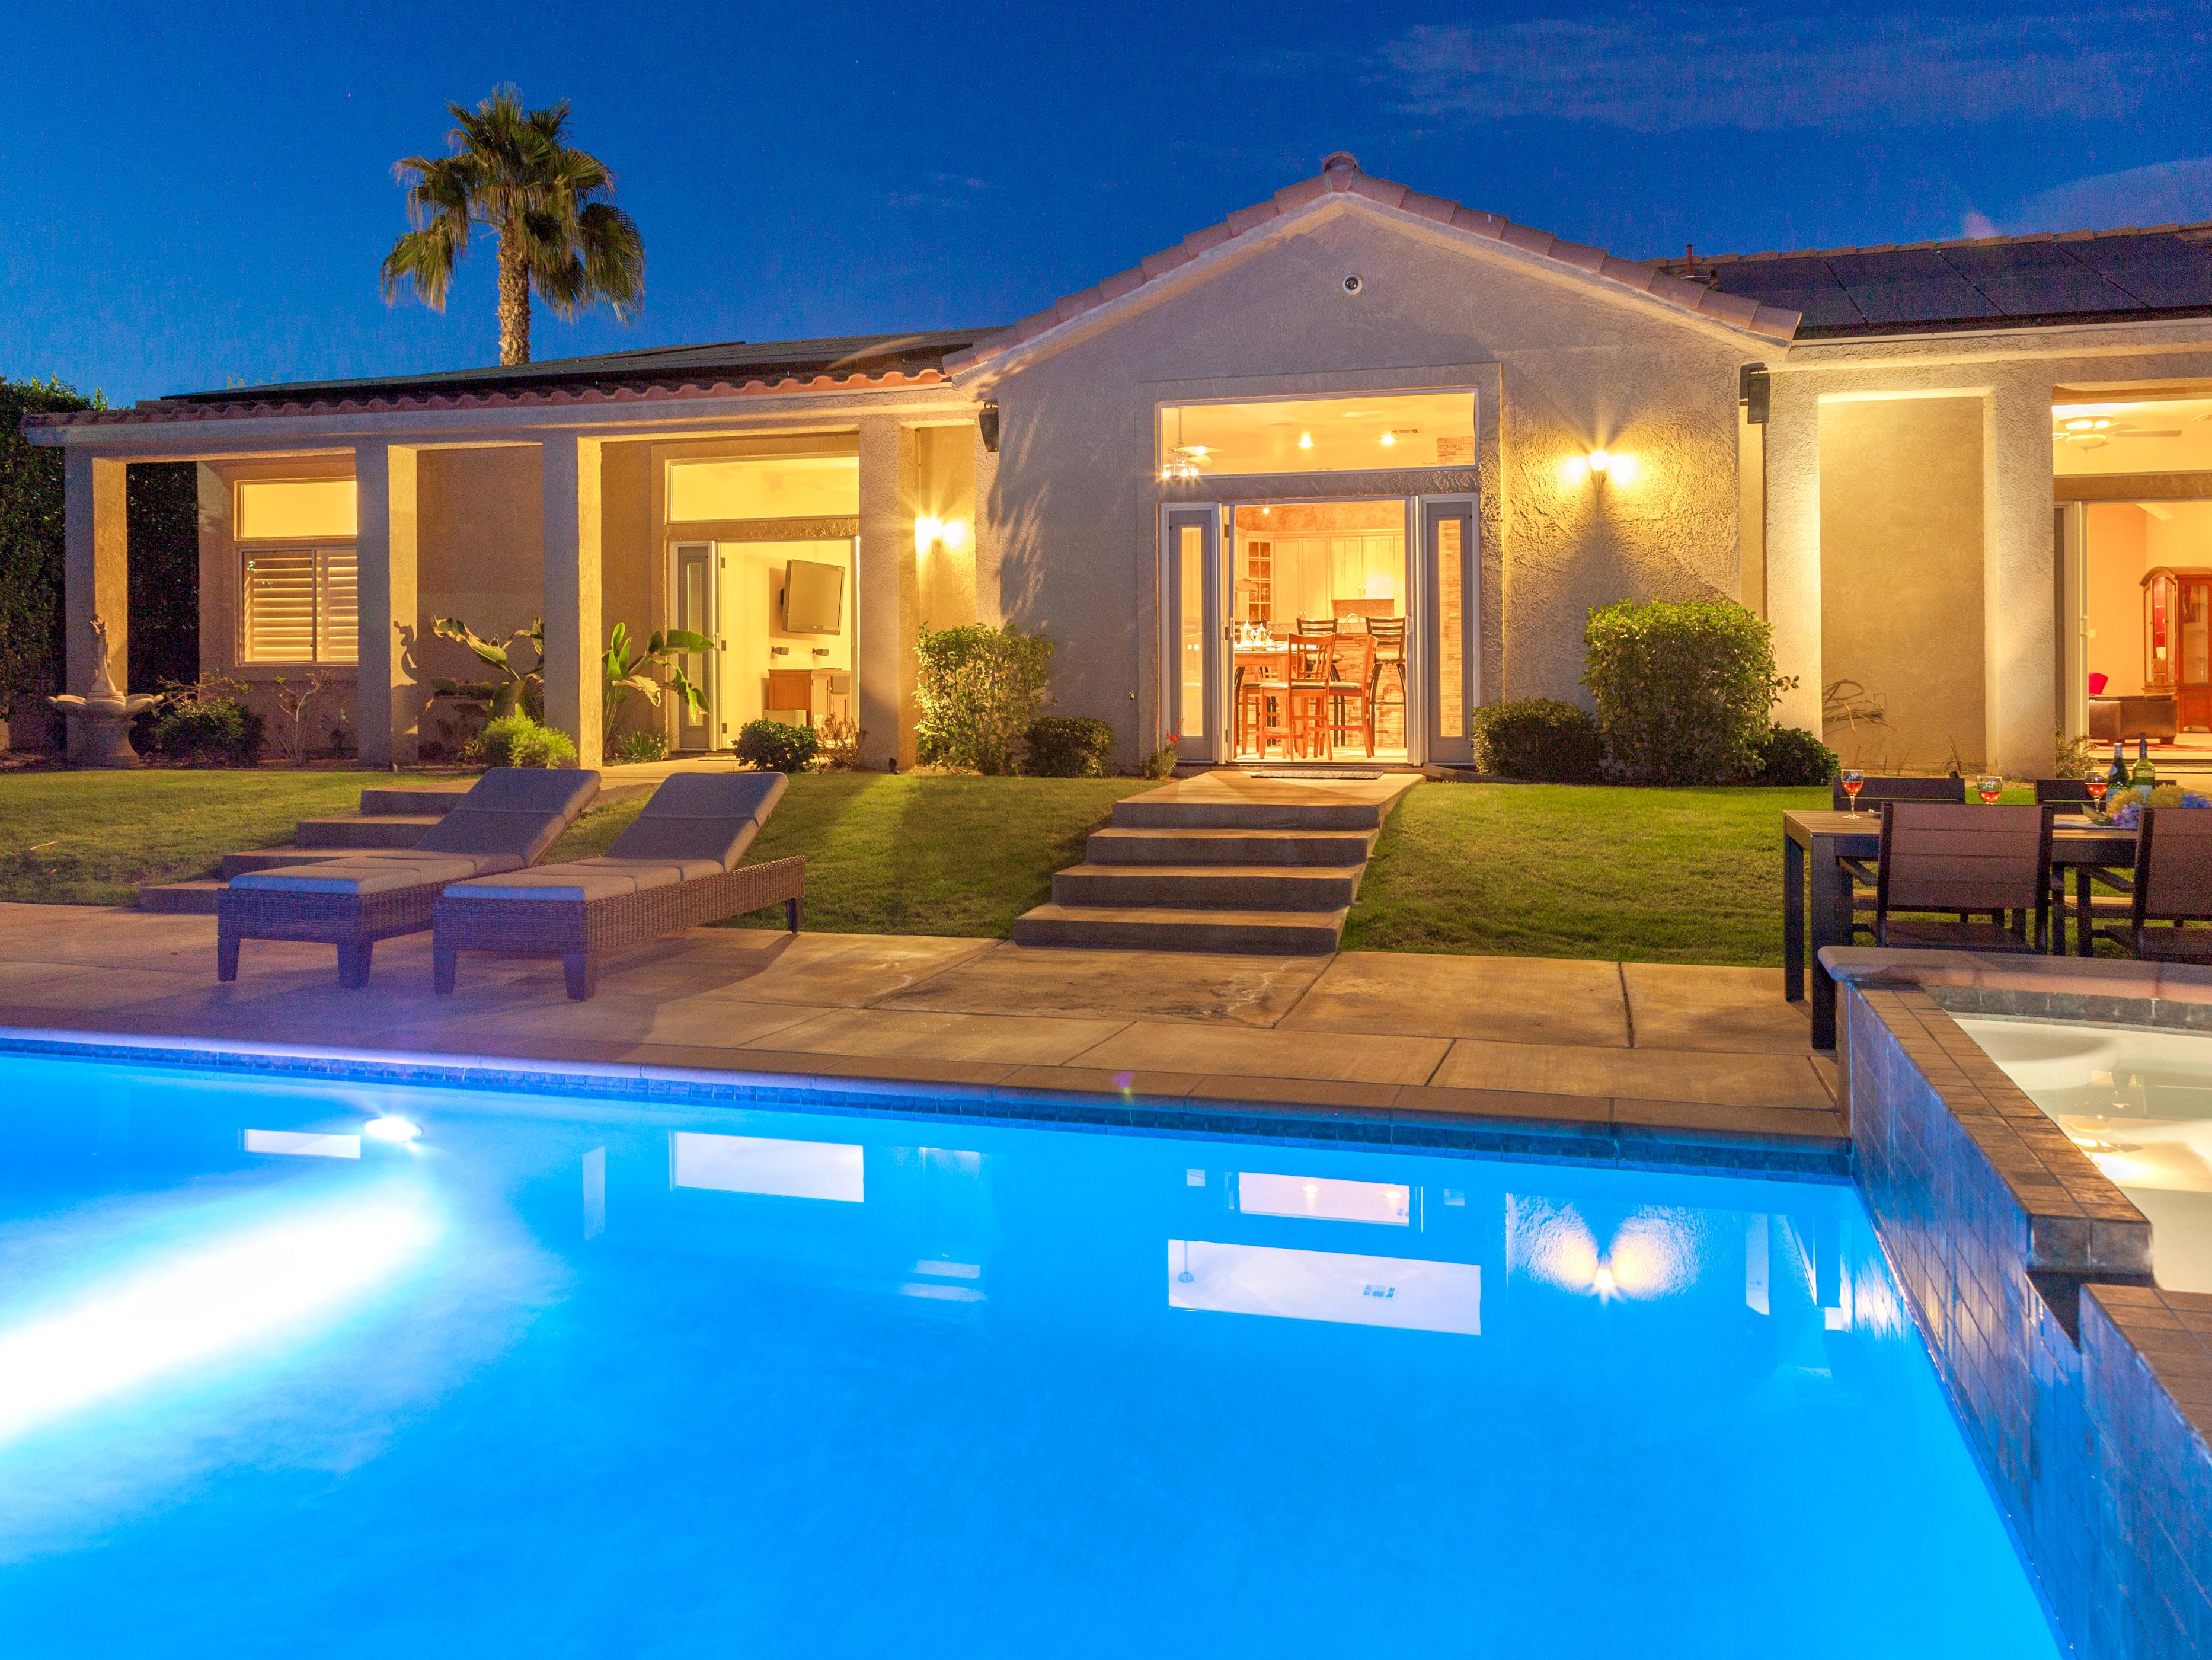 Where to Stay near Coachella.